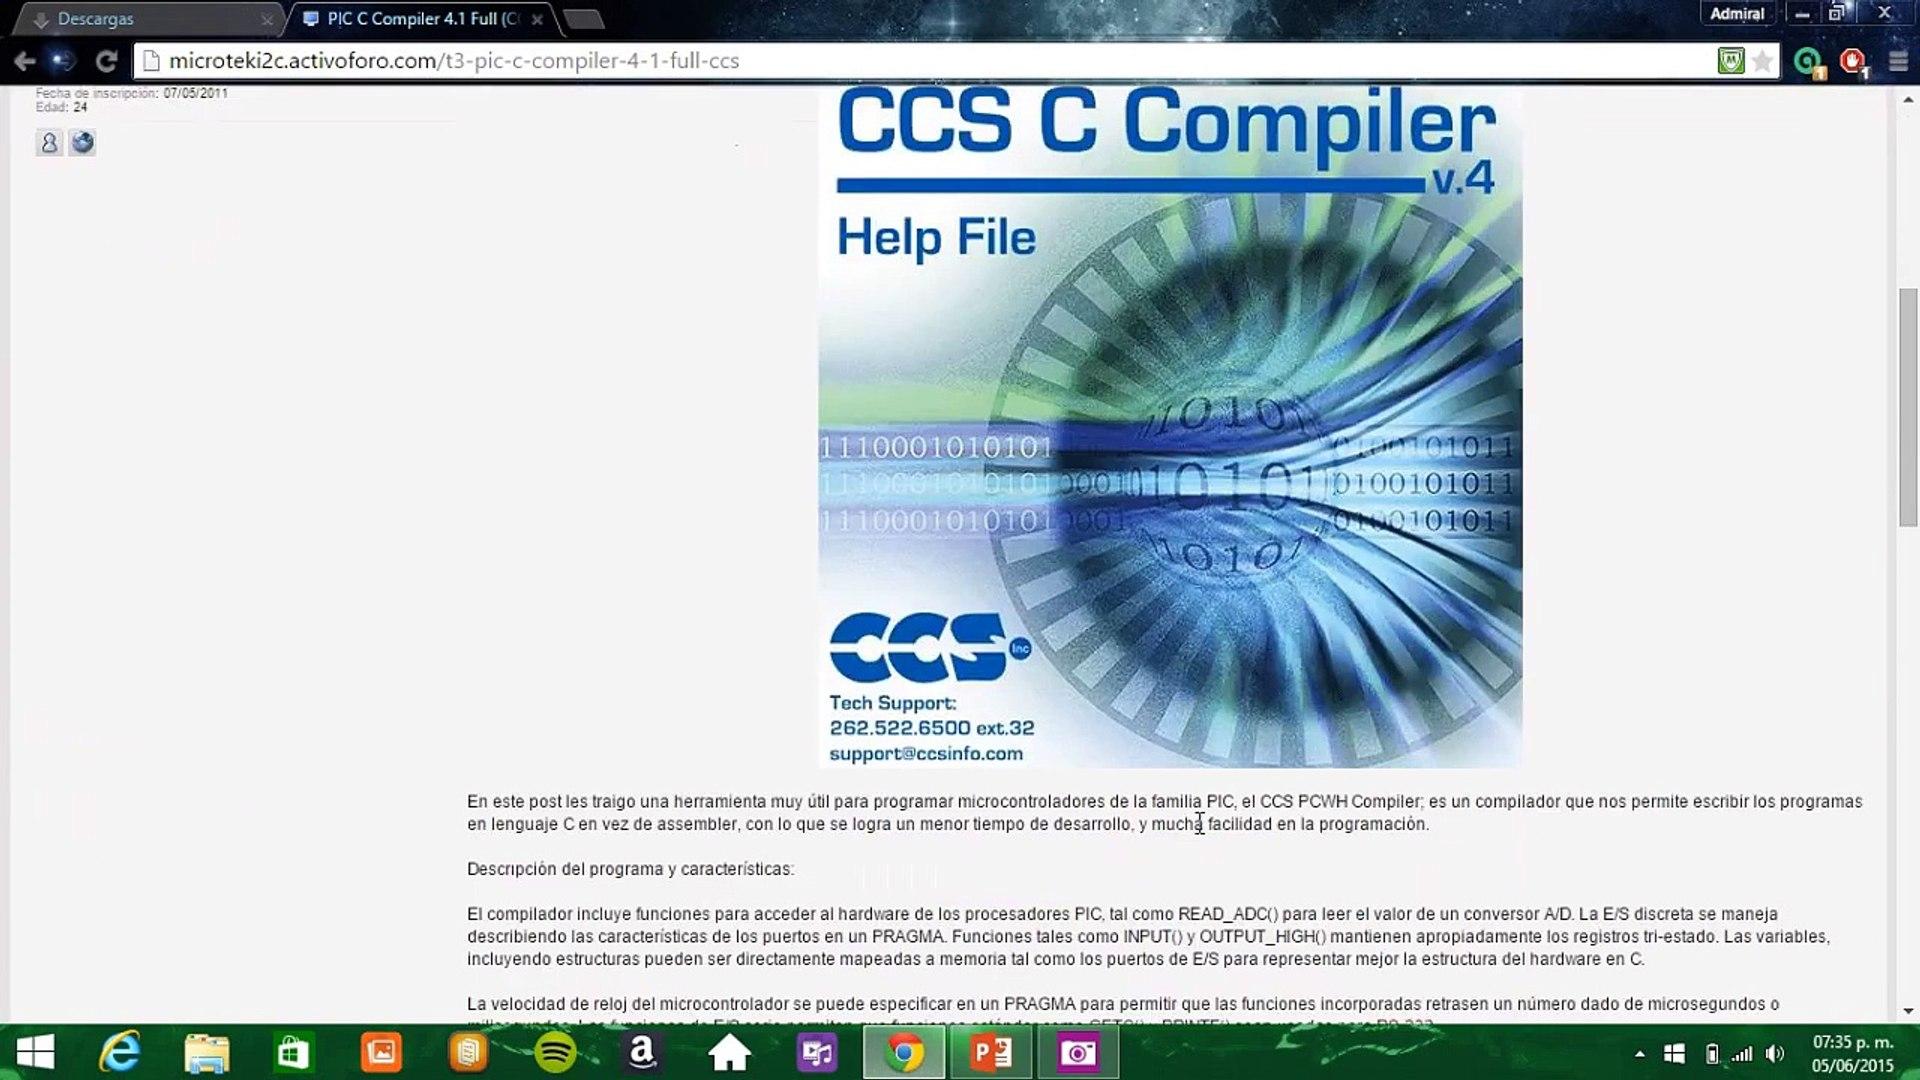 Video Tutorial - Instalar PIC C Compiler 4 1 Full (CCS)